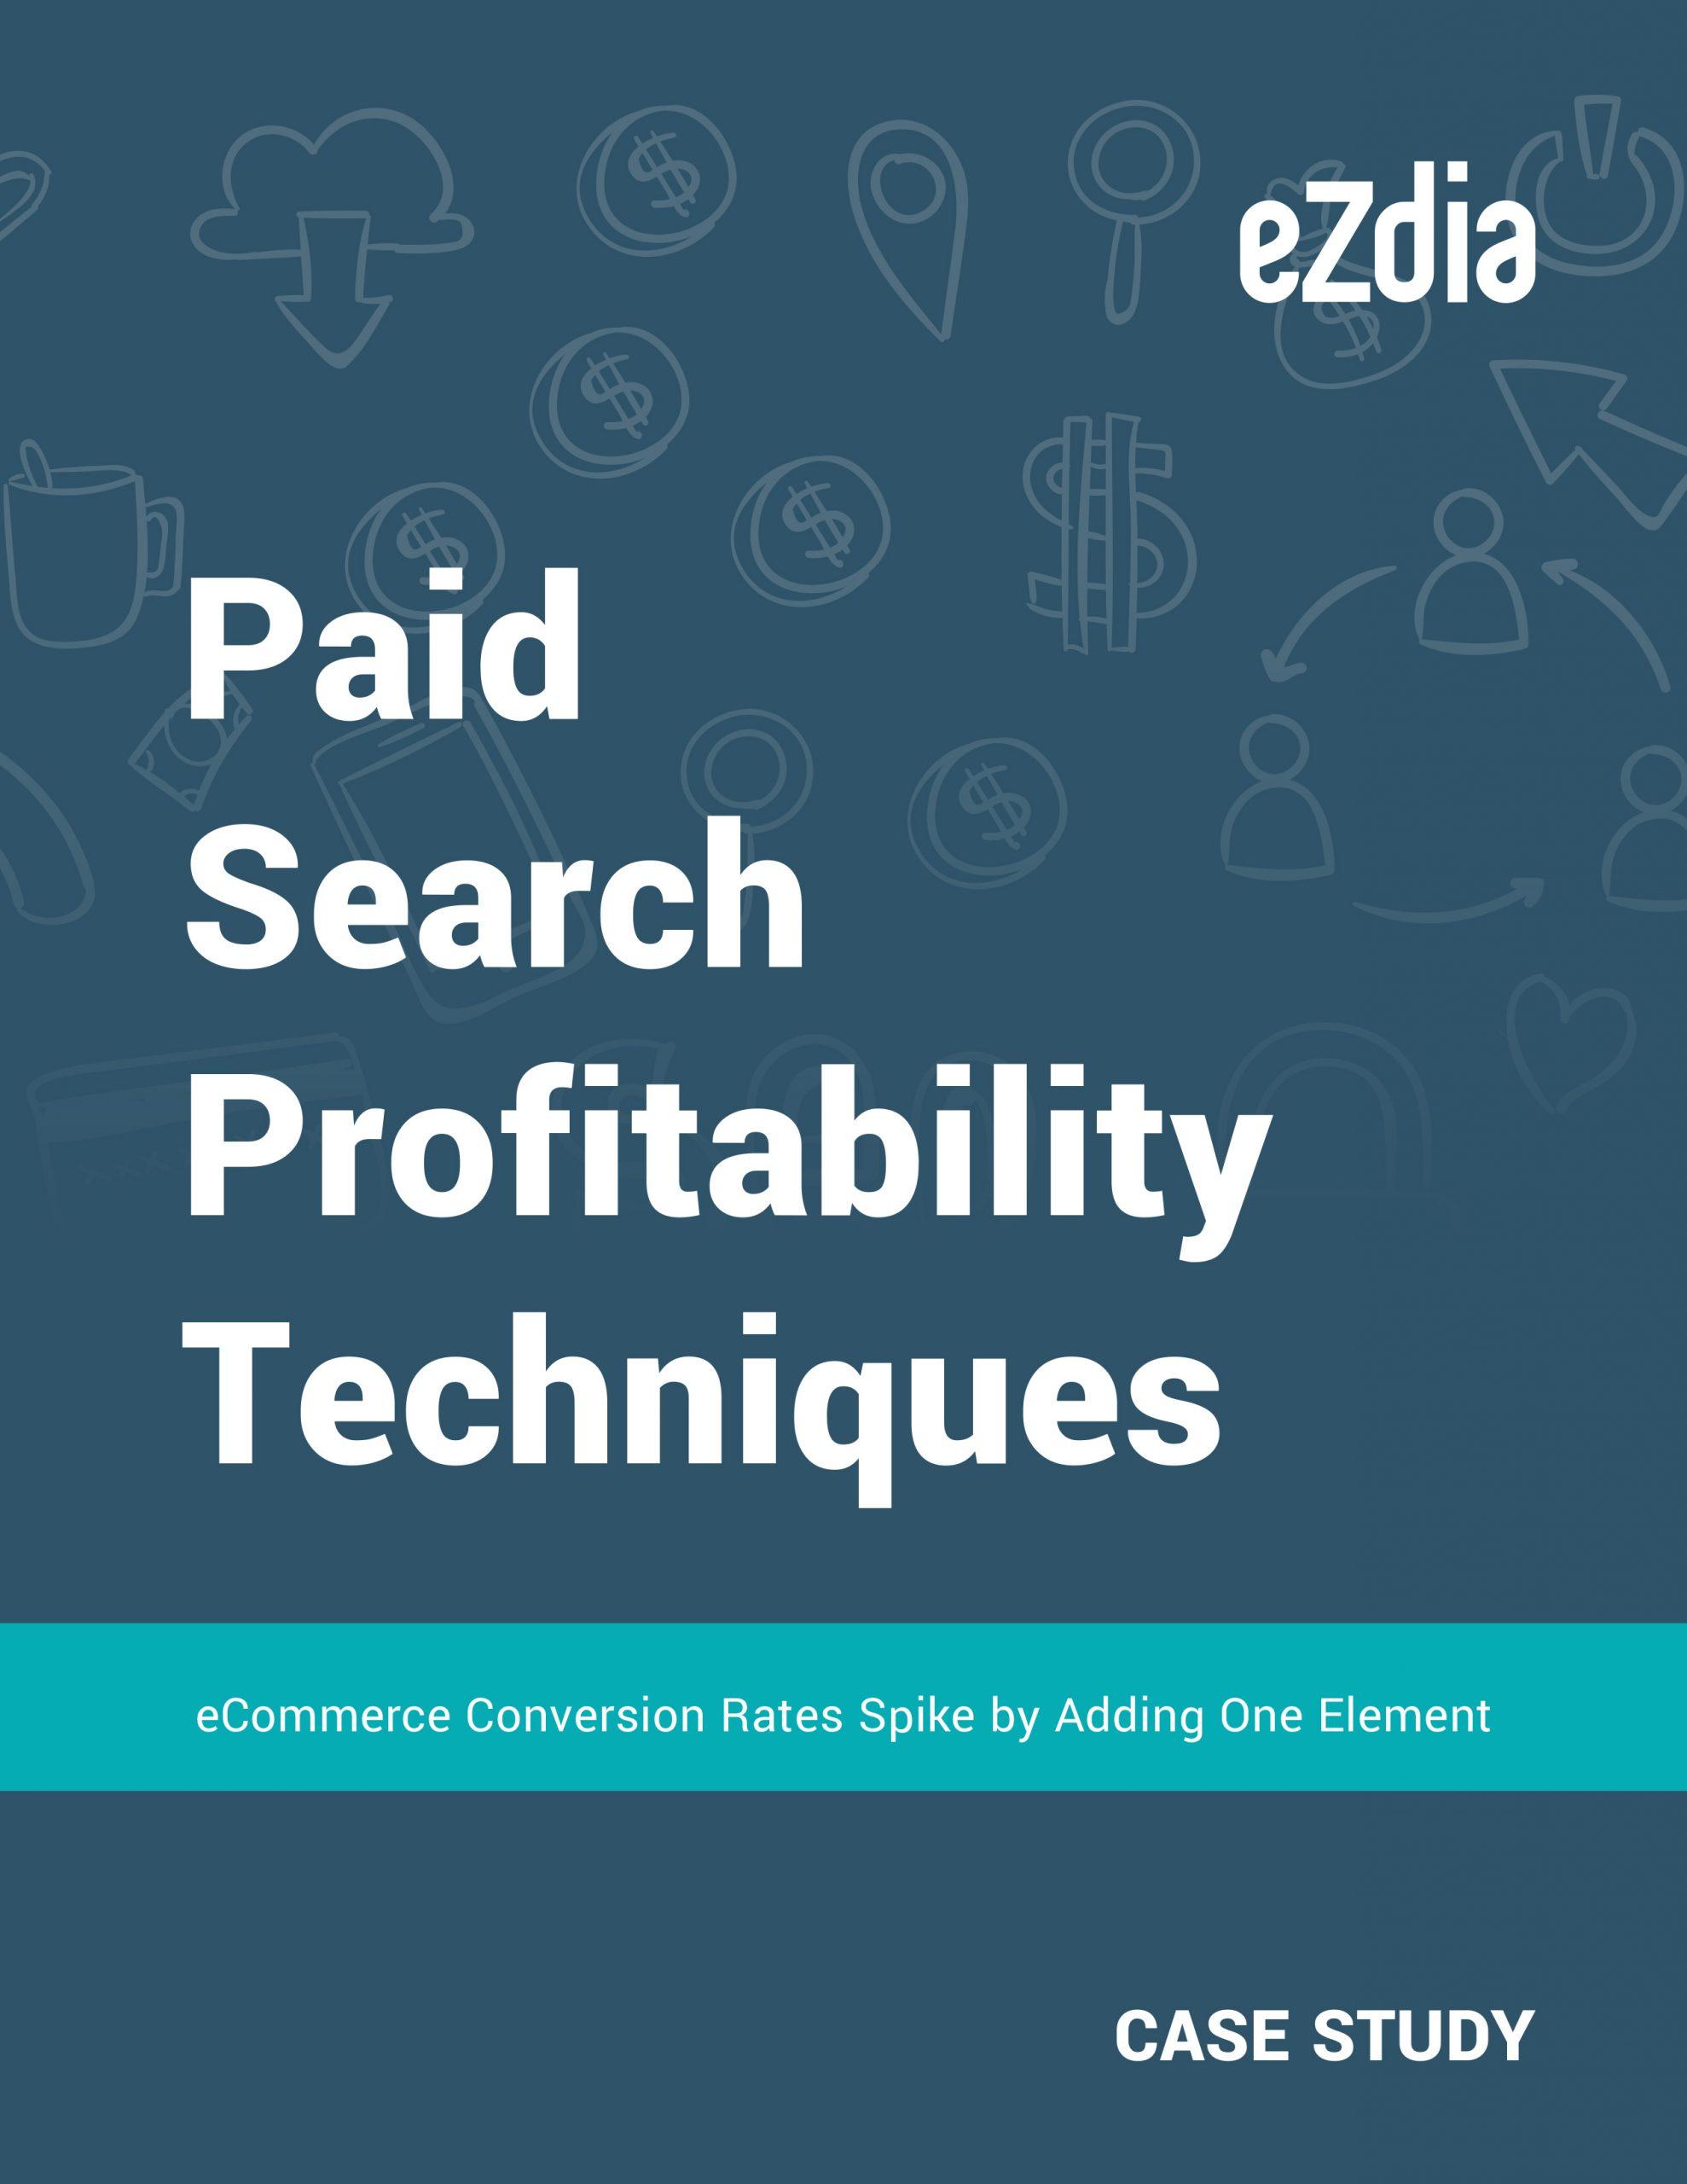 Paid Search Profitability Techniques